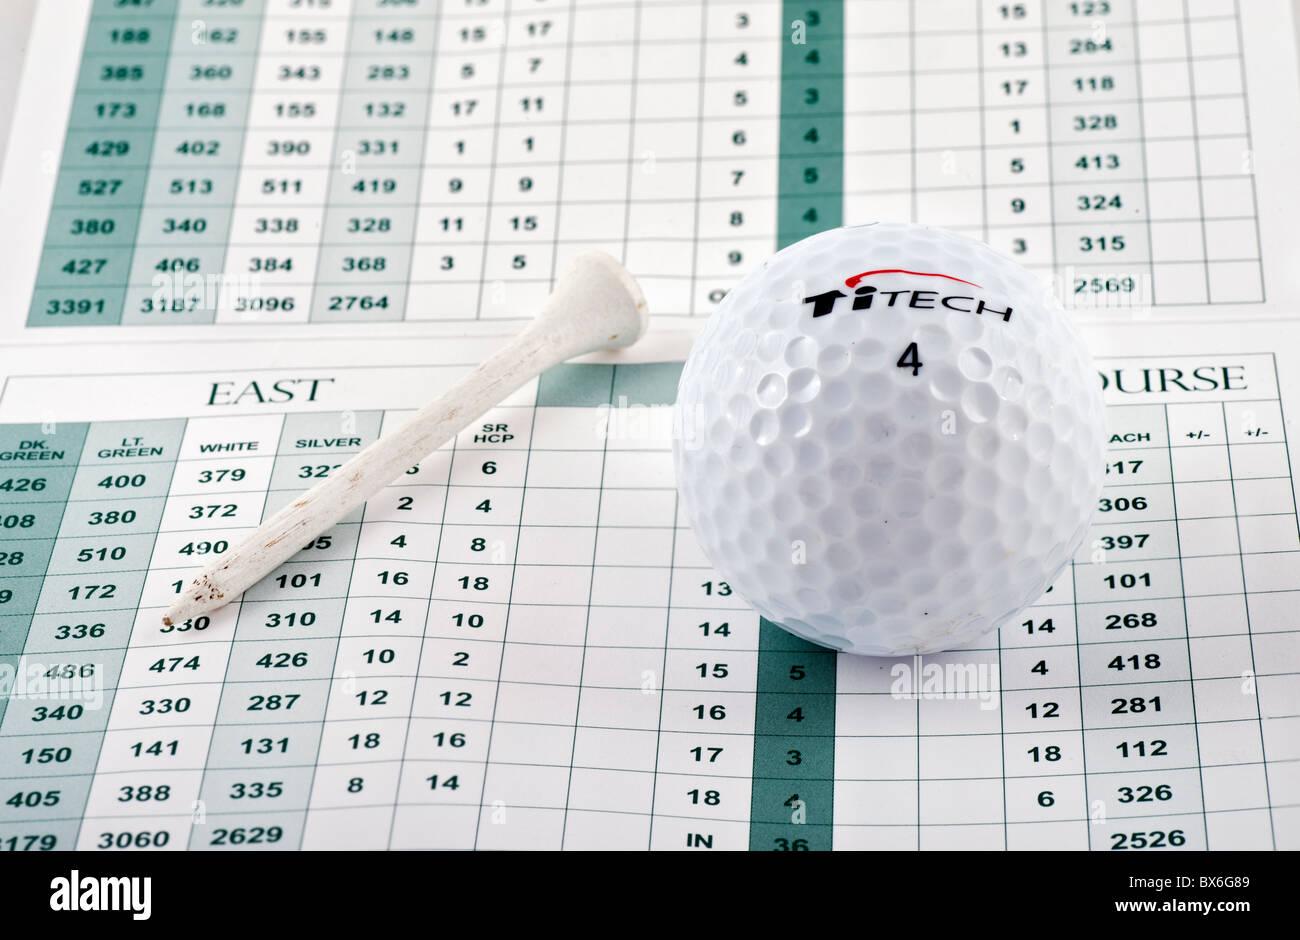 Pallina da golf, tee e score card, Florida, Stati Uniti d'America Immagini Stock